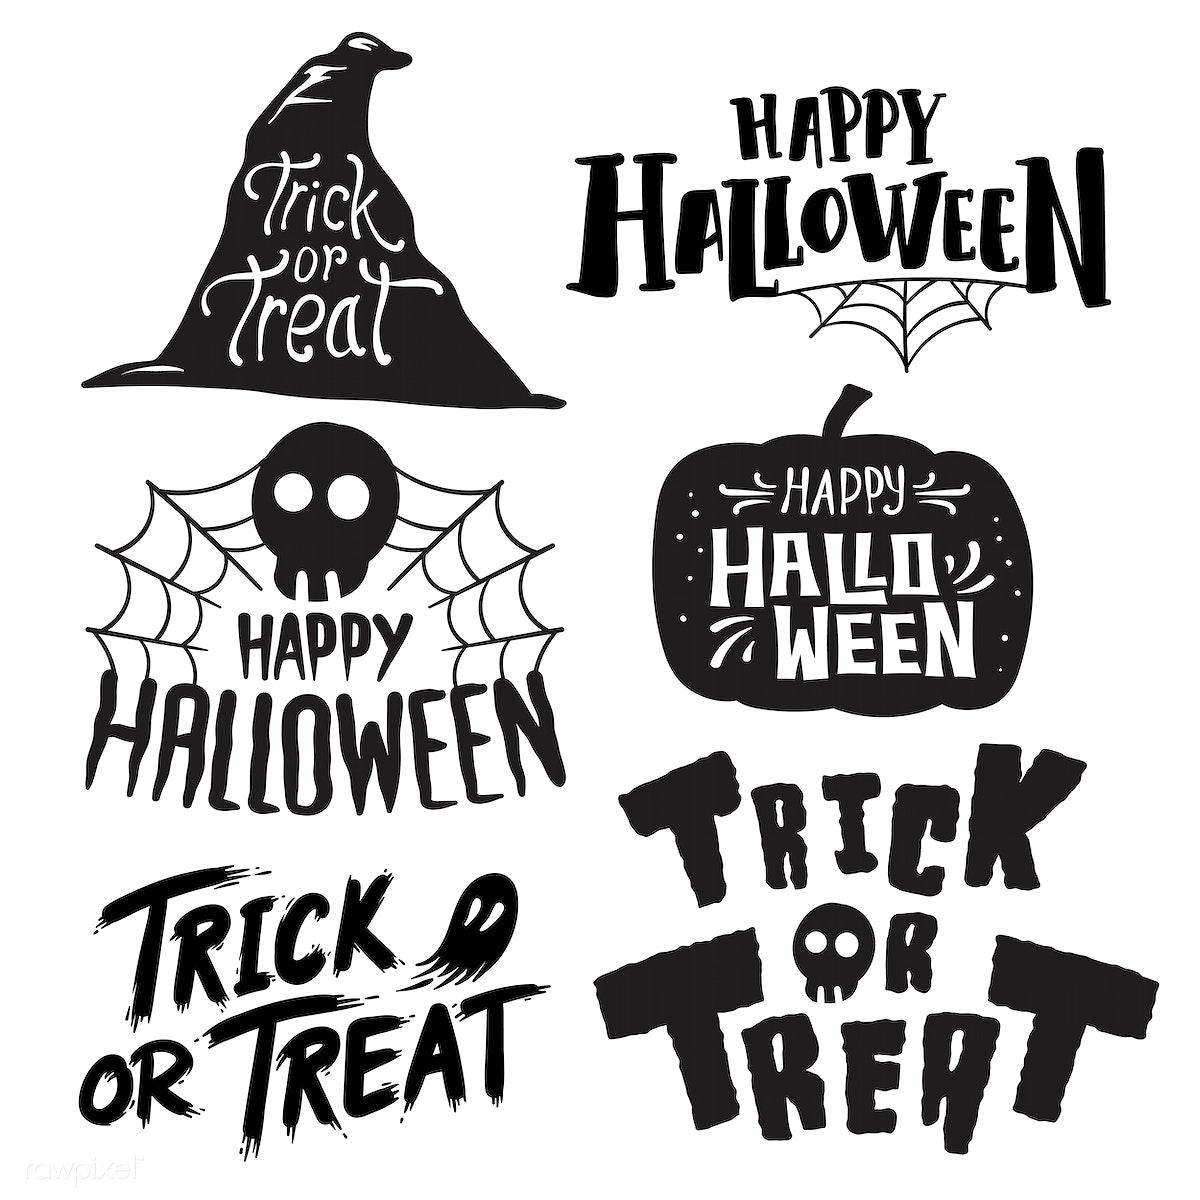 Halloween Vector Black And White.Set Of Happy Halloween Vectors Free Stock Illustration 497014